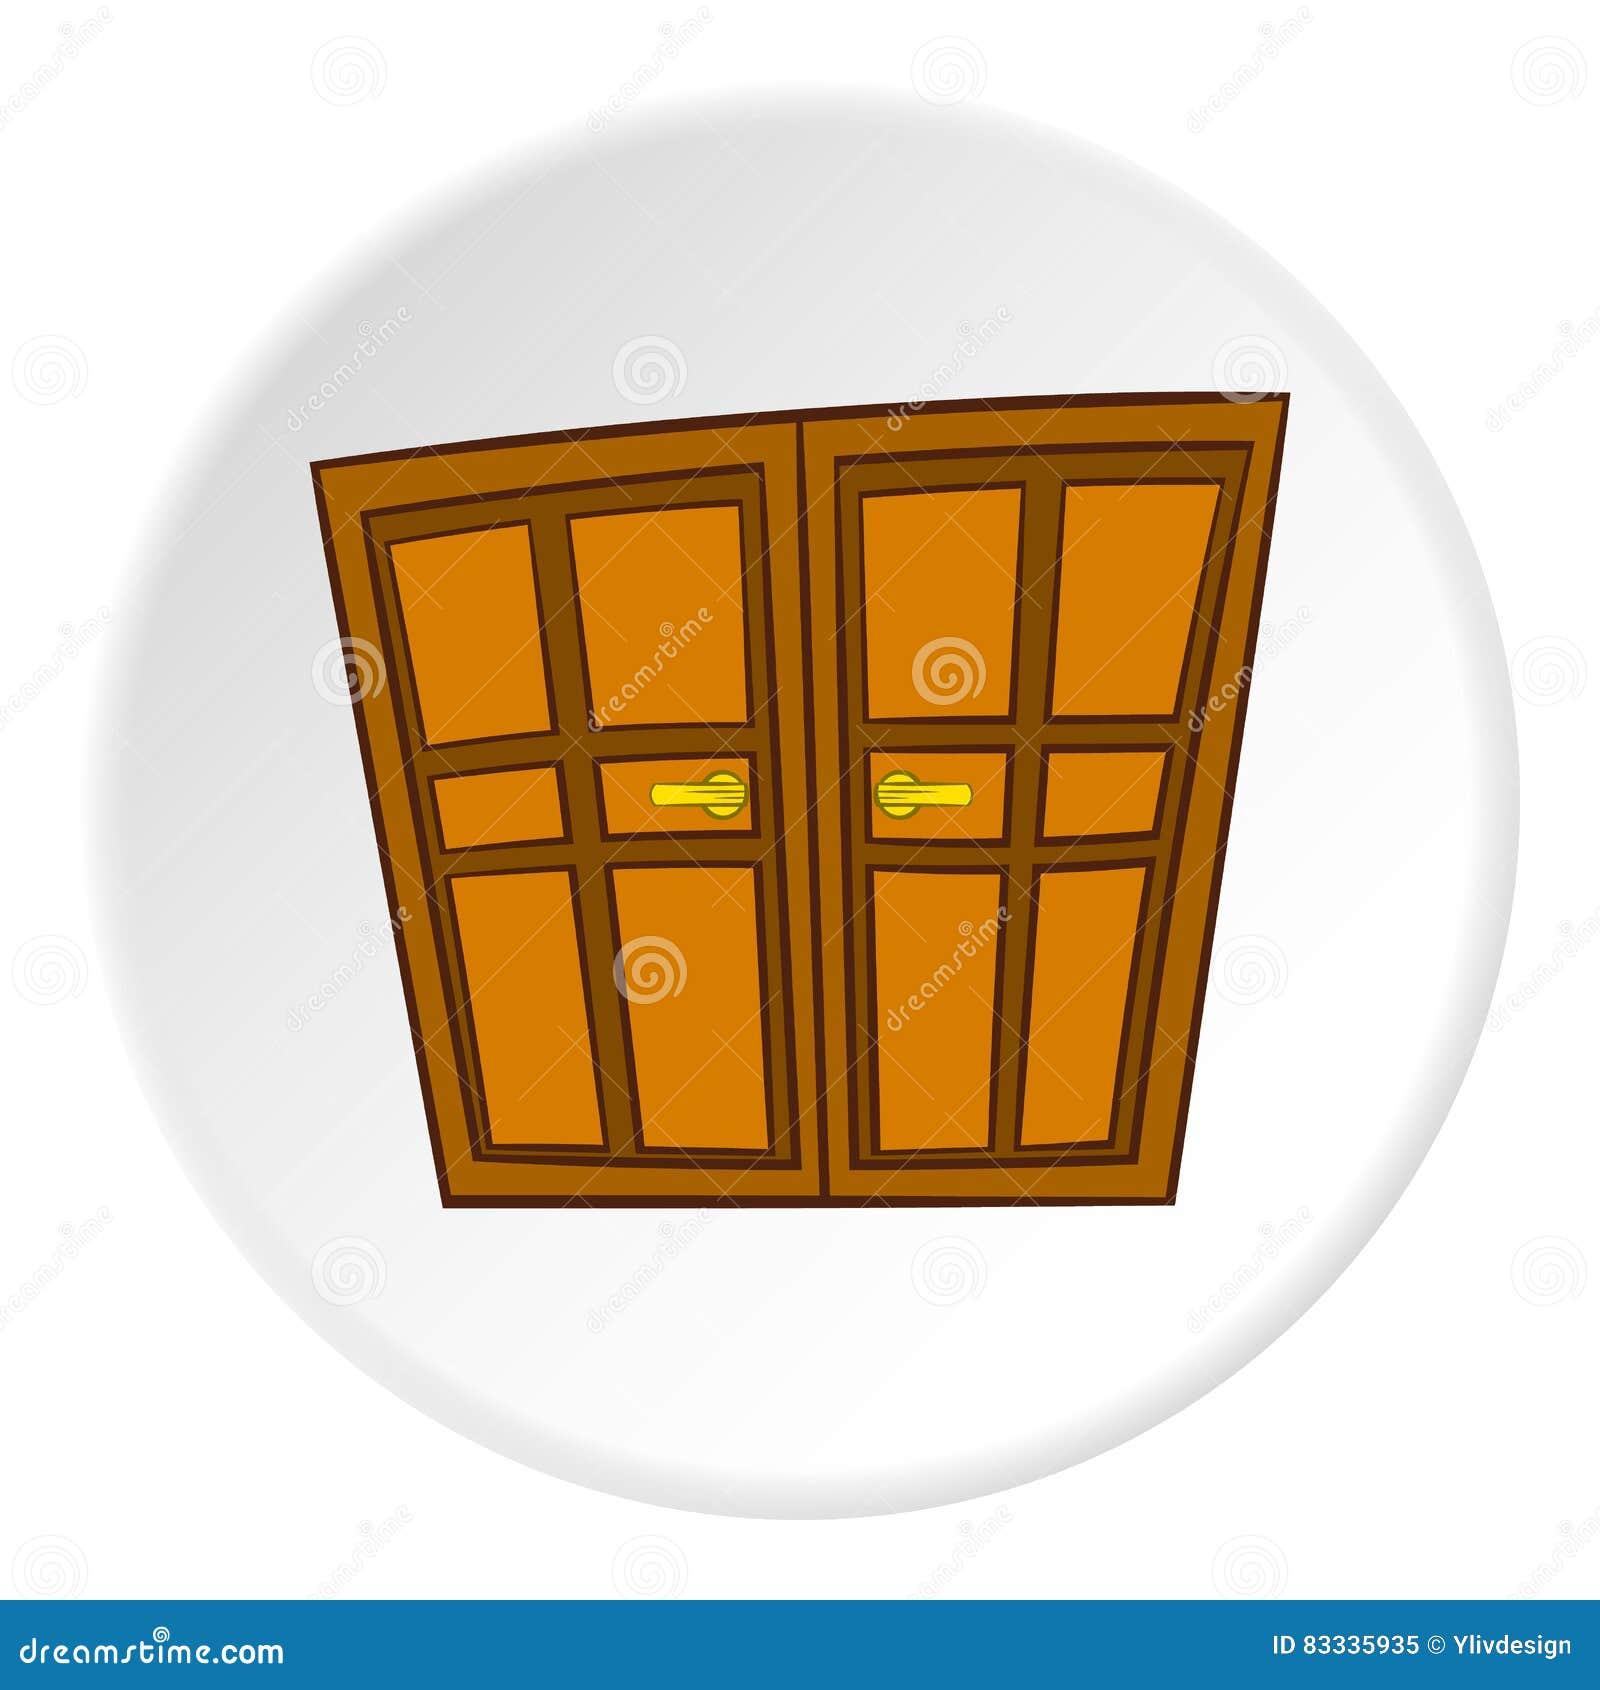 Double Door Icon Cartoon Style Stock Vector Illustration Of House